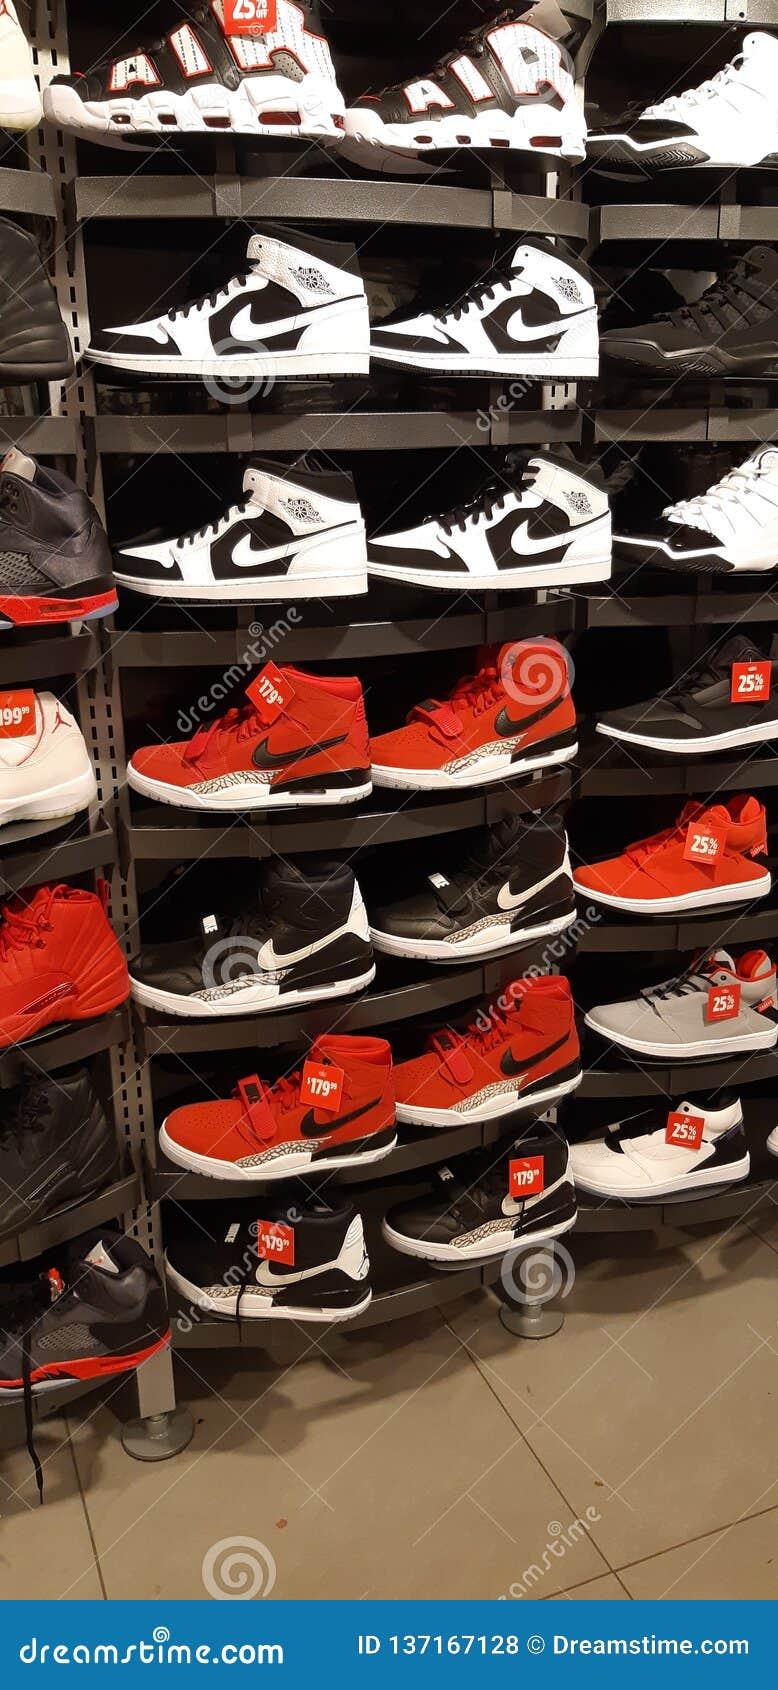 Nike Sport Brand Footlocker Canada Red Black White Hightop